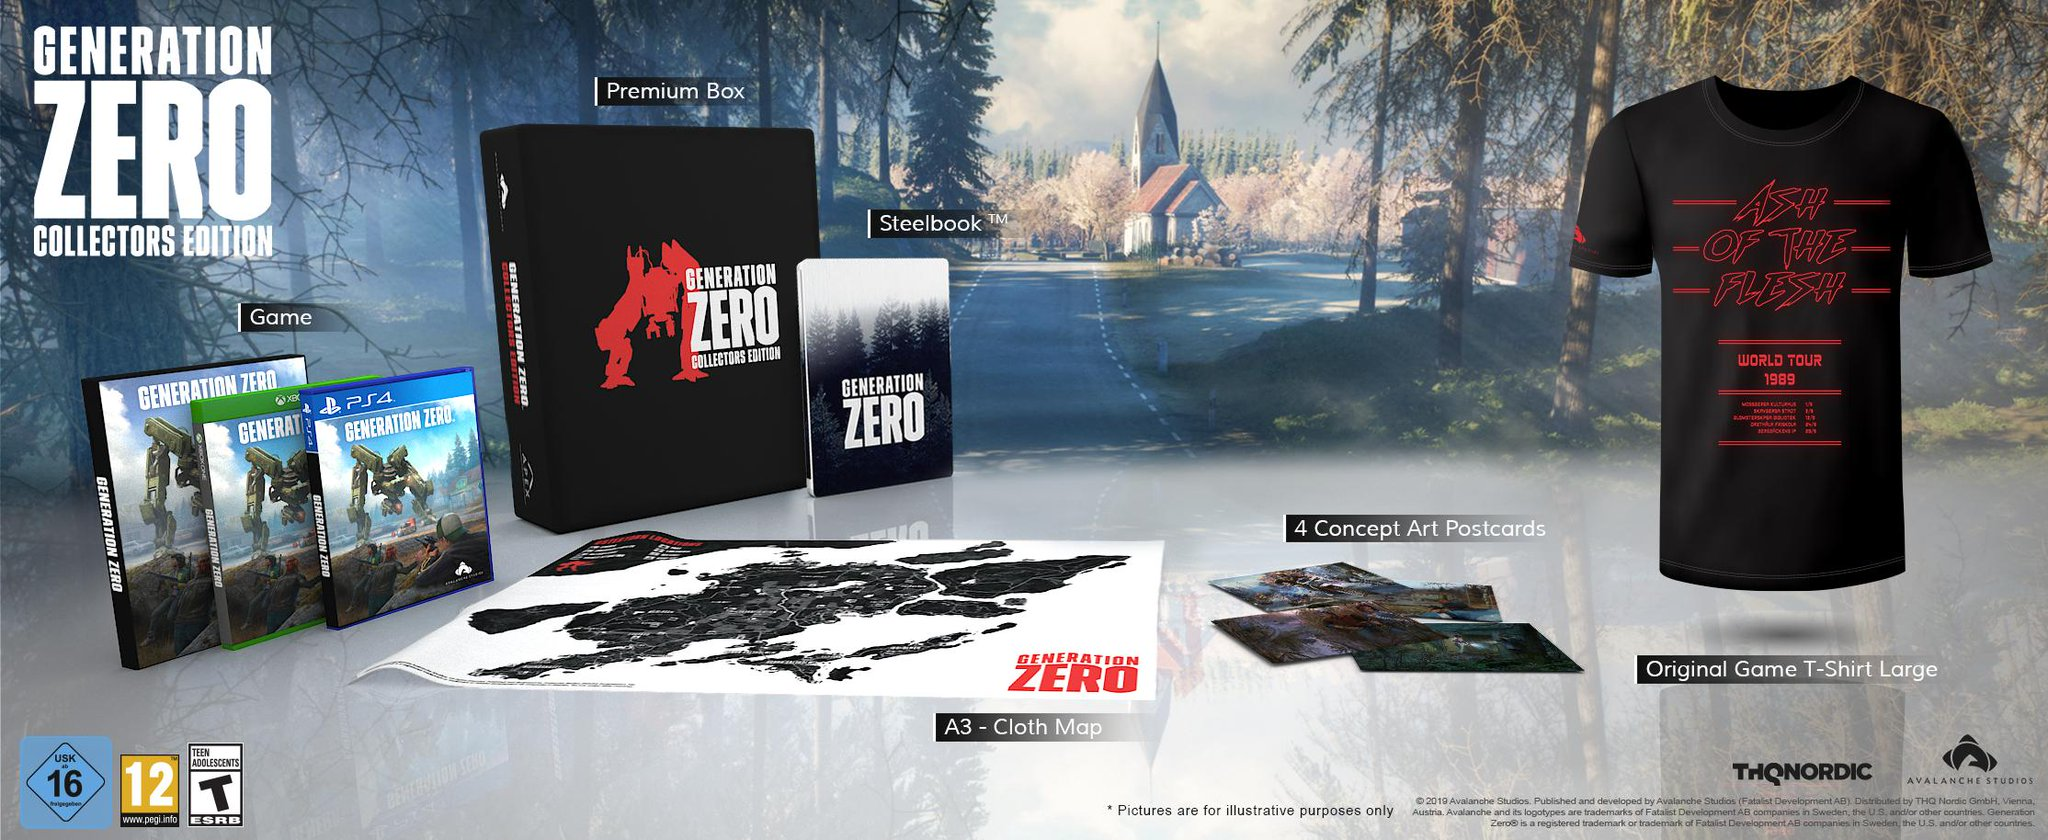 Generation Zero Collector's Edition